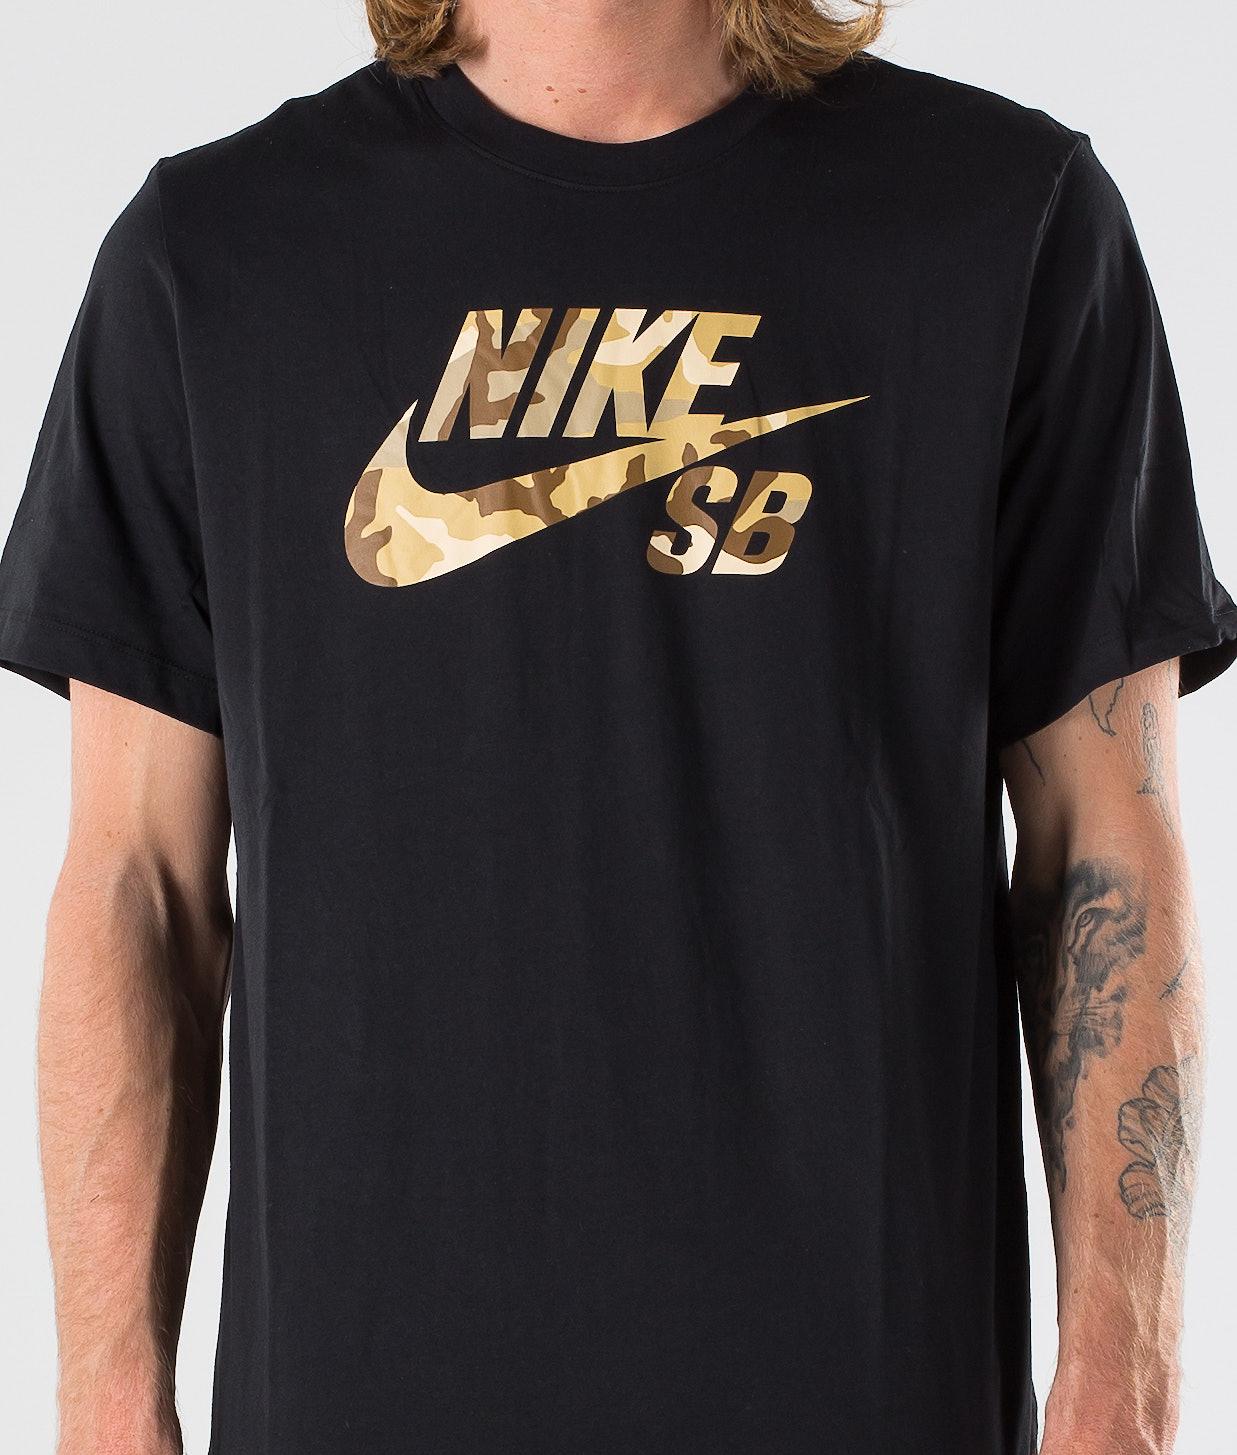 aa9fc34aec9e Nike SB Logo Snsl 2 T-shirt Black - Ridestore.com